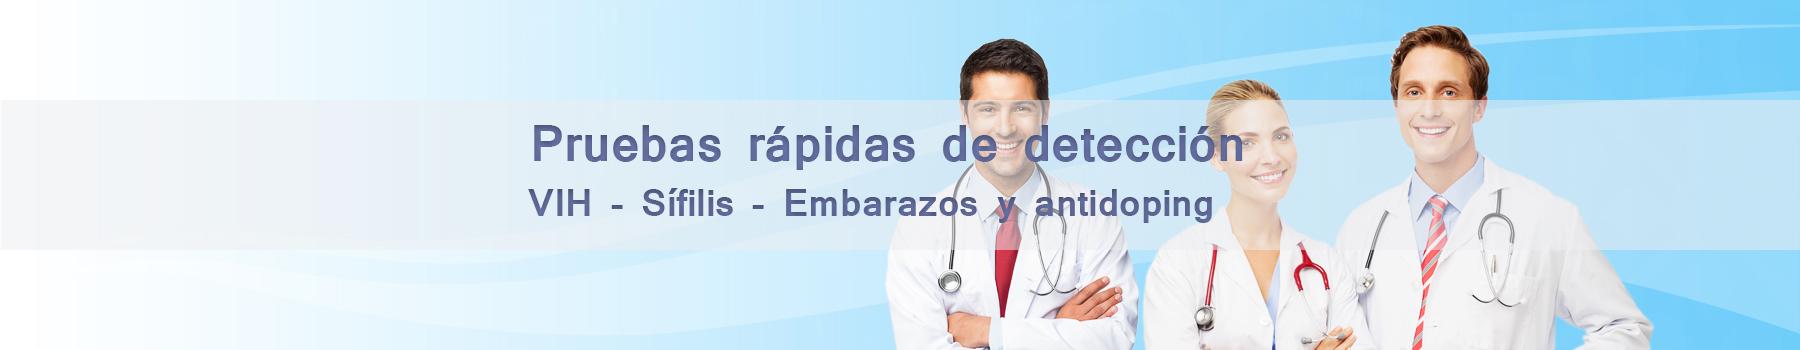 pruebas-rapidas-vhi-cancun2